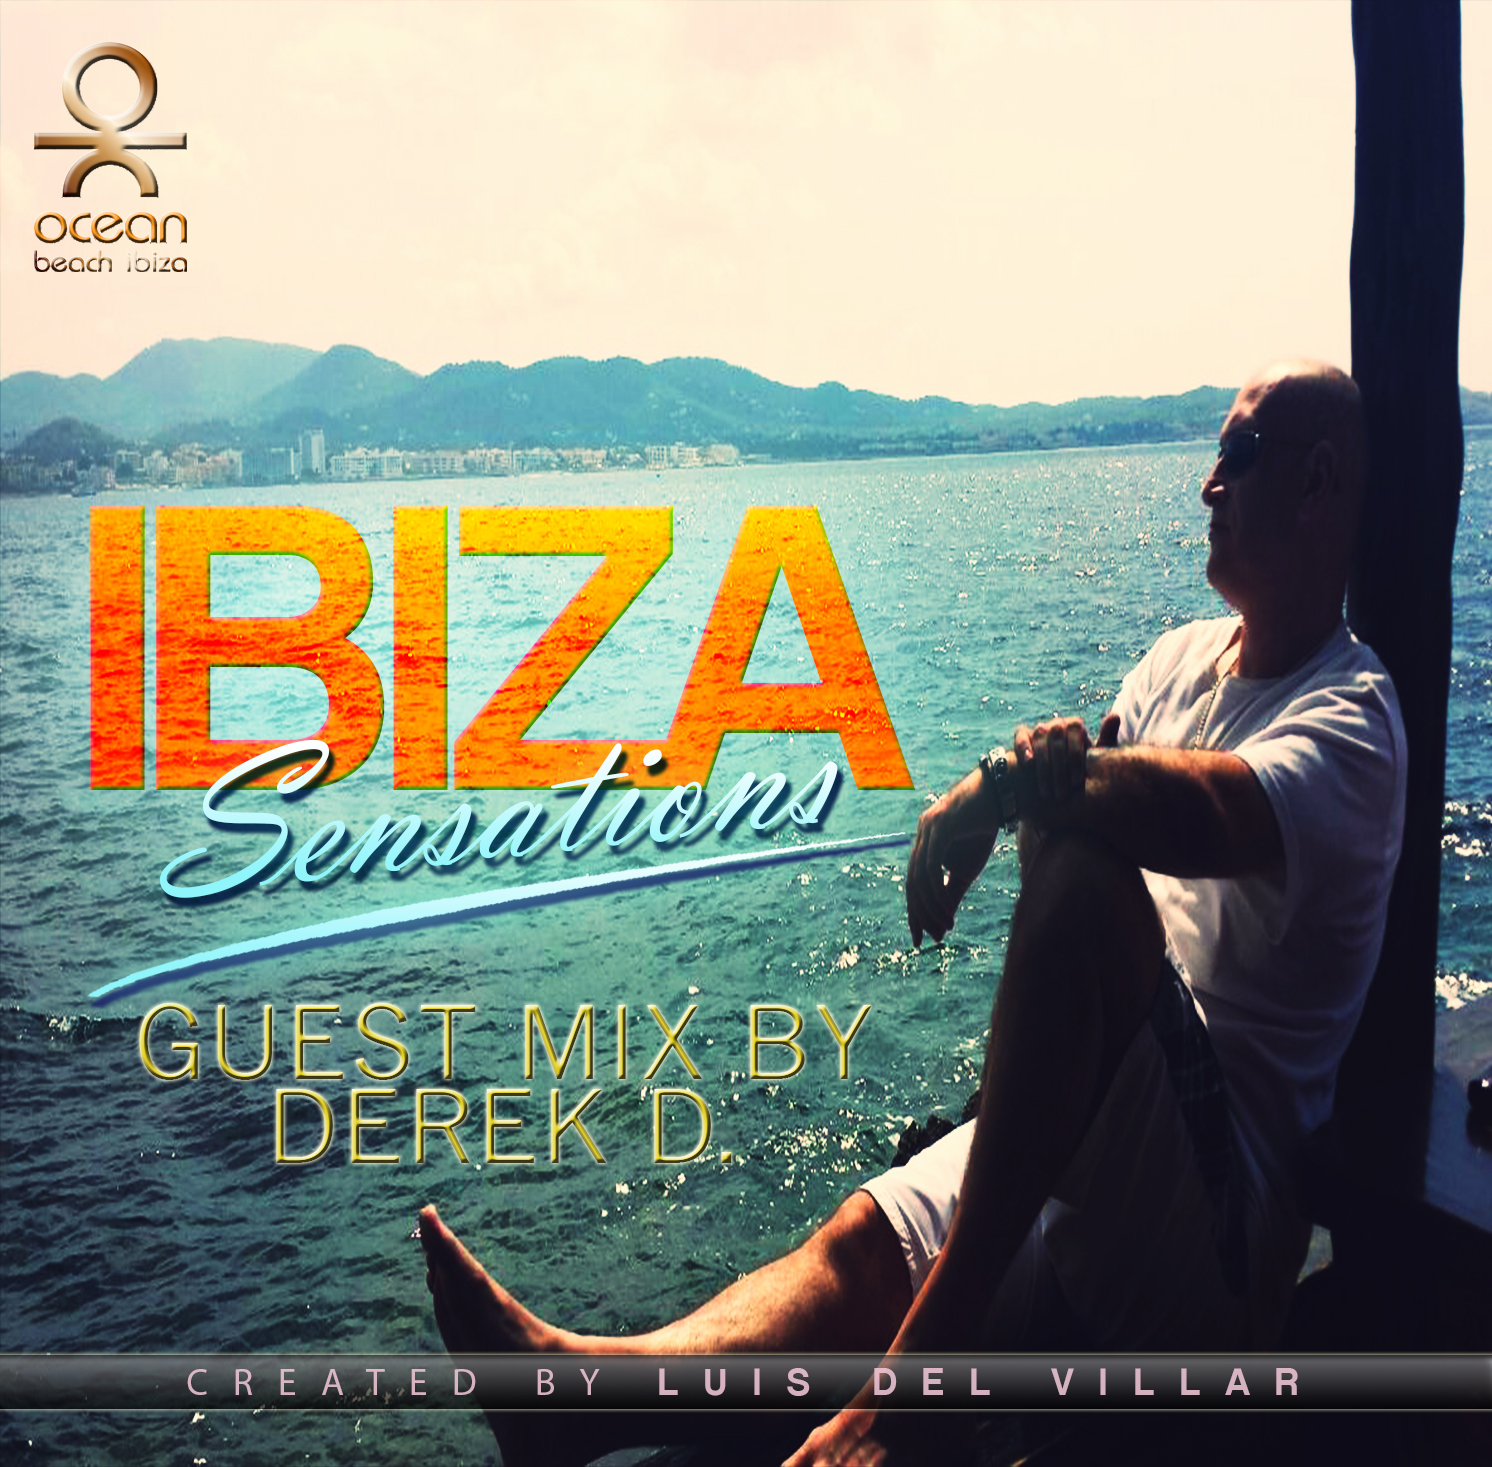 Artwork for Ibiza Sensations 115 Guest mix by Derek D. (Beachgrooves Radio - Costa del Sol)